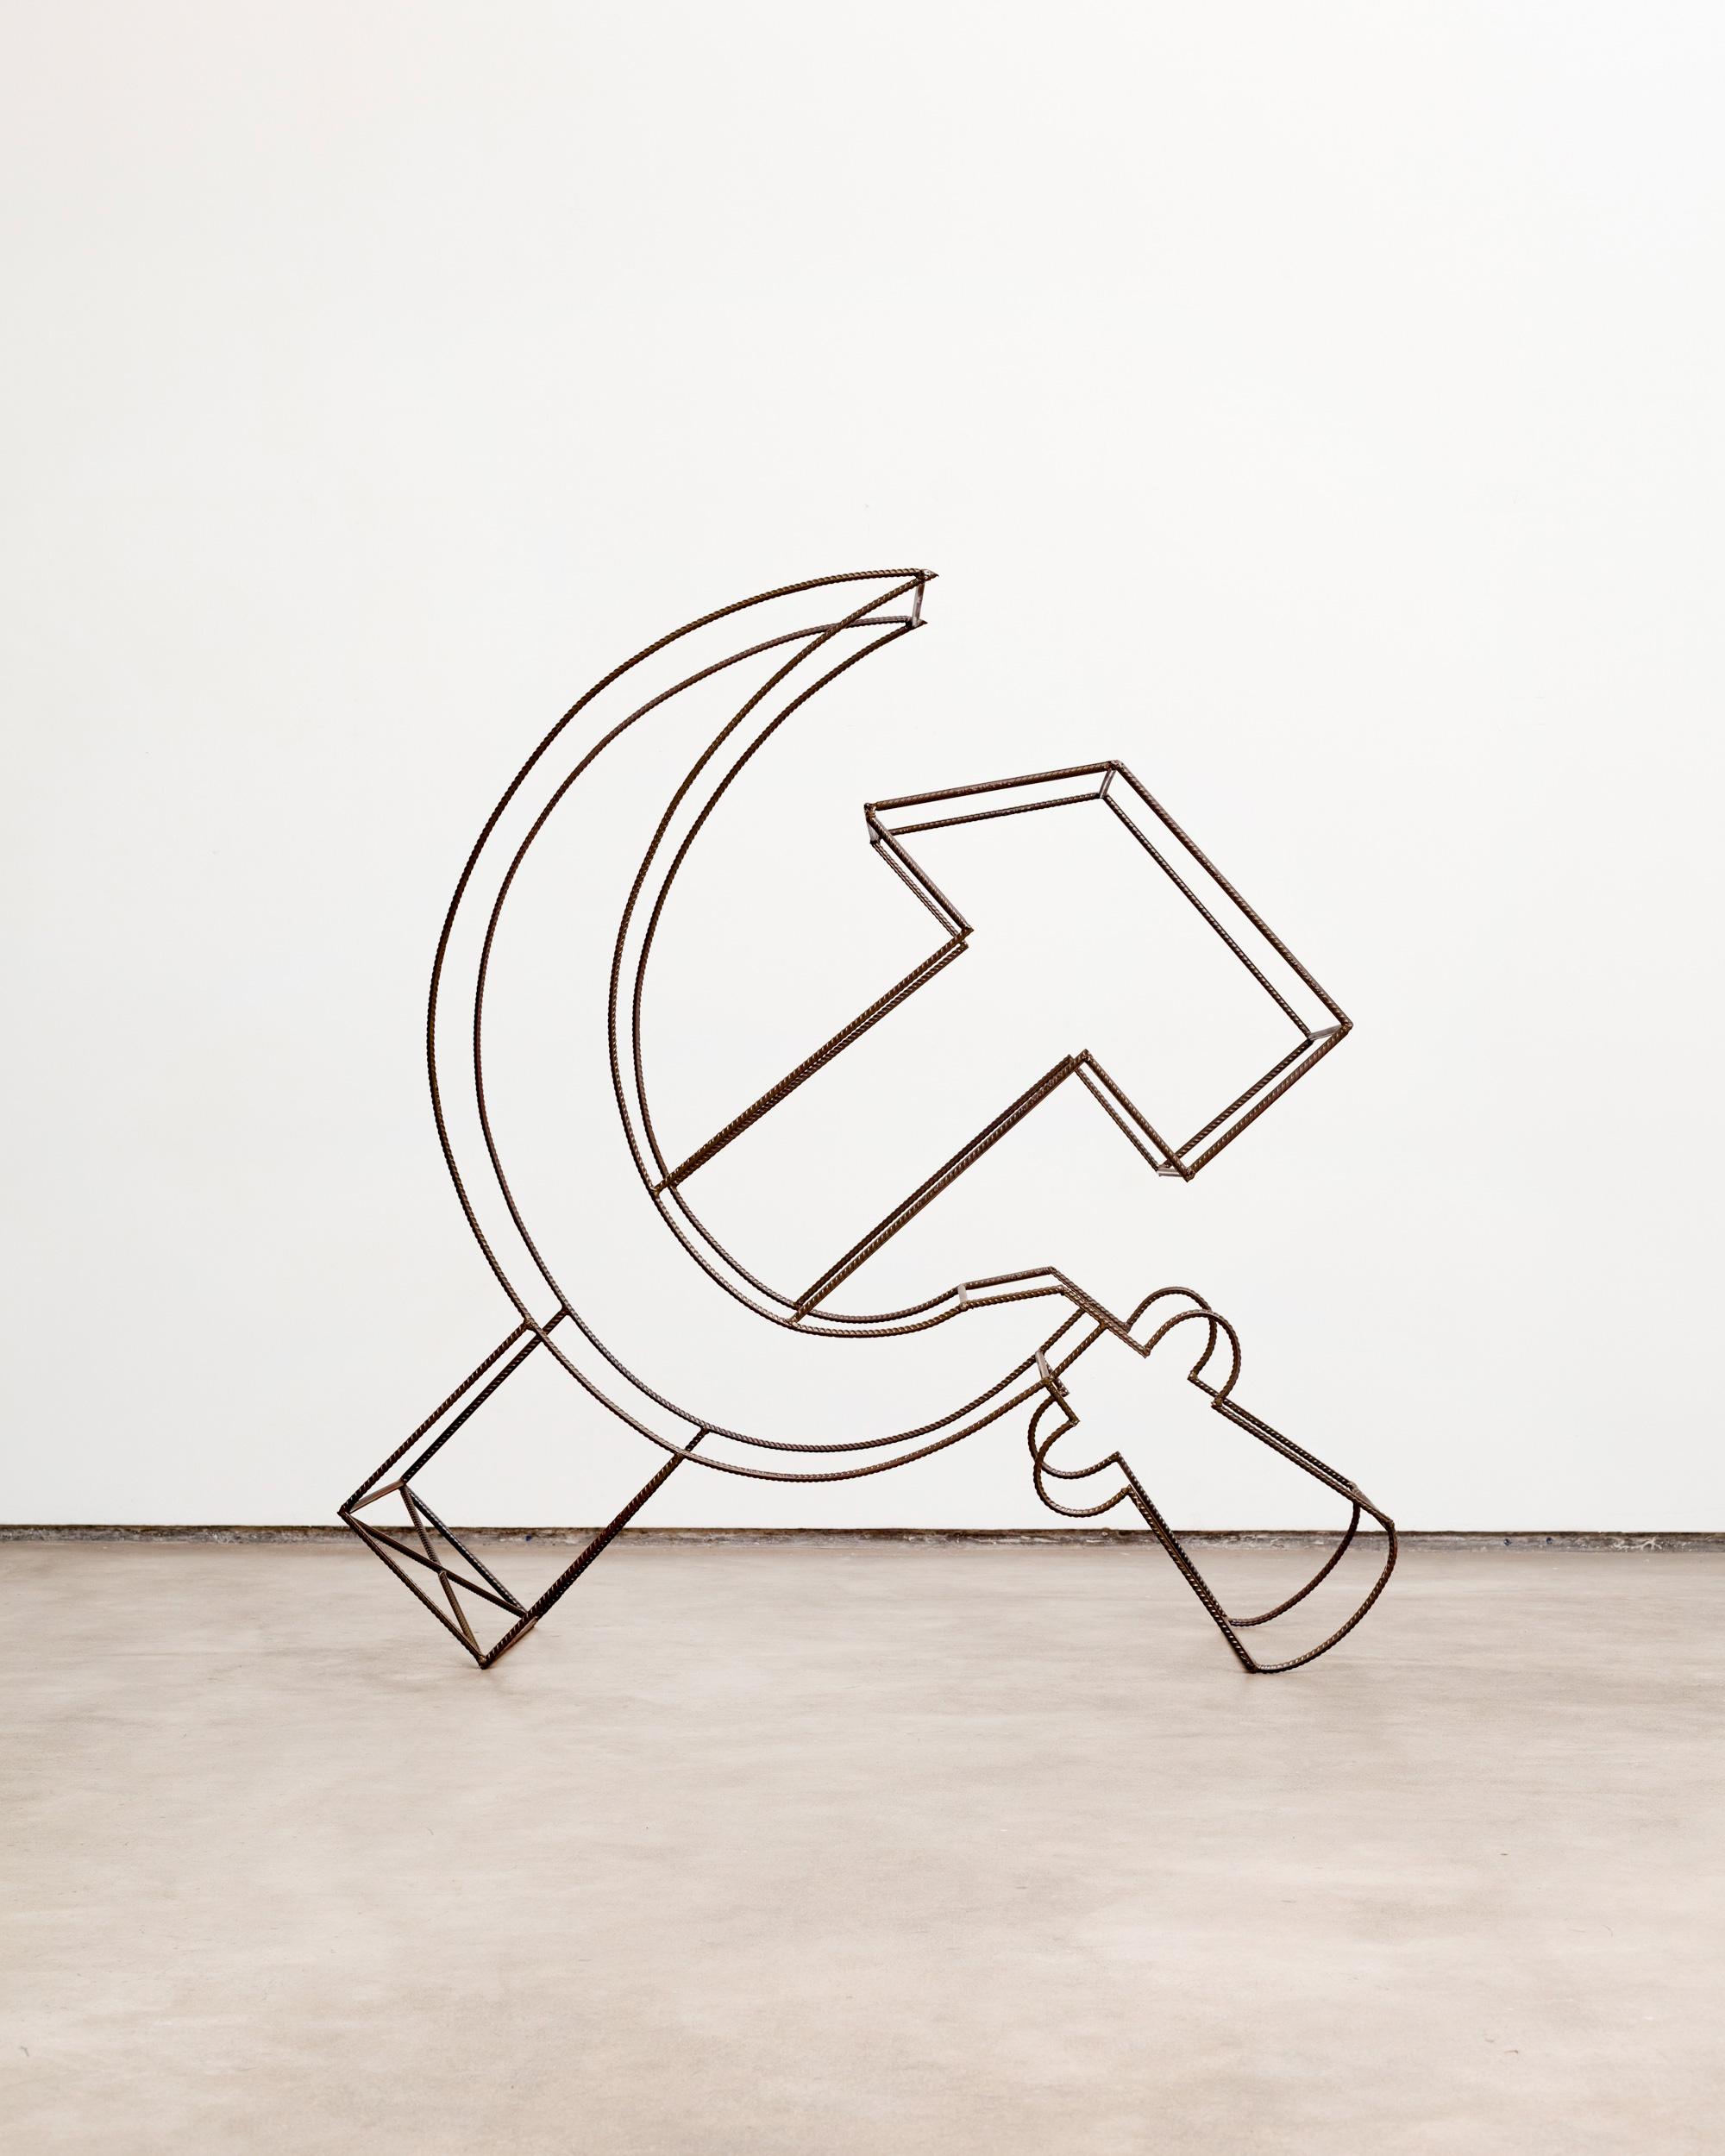 Galerie Barbara Thumm \ Fernando Bryce – Posguerra Perú